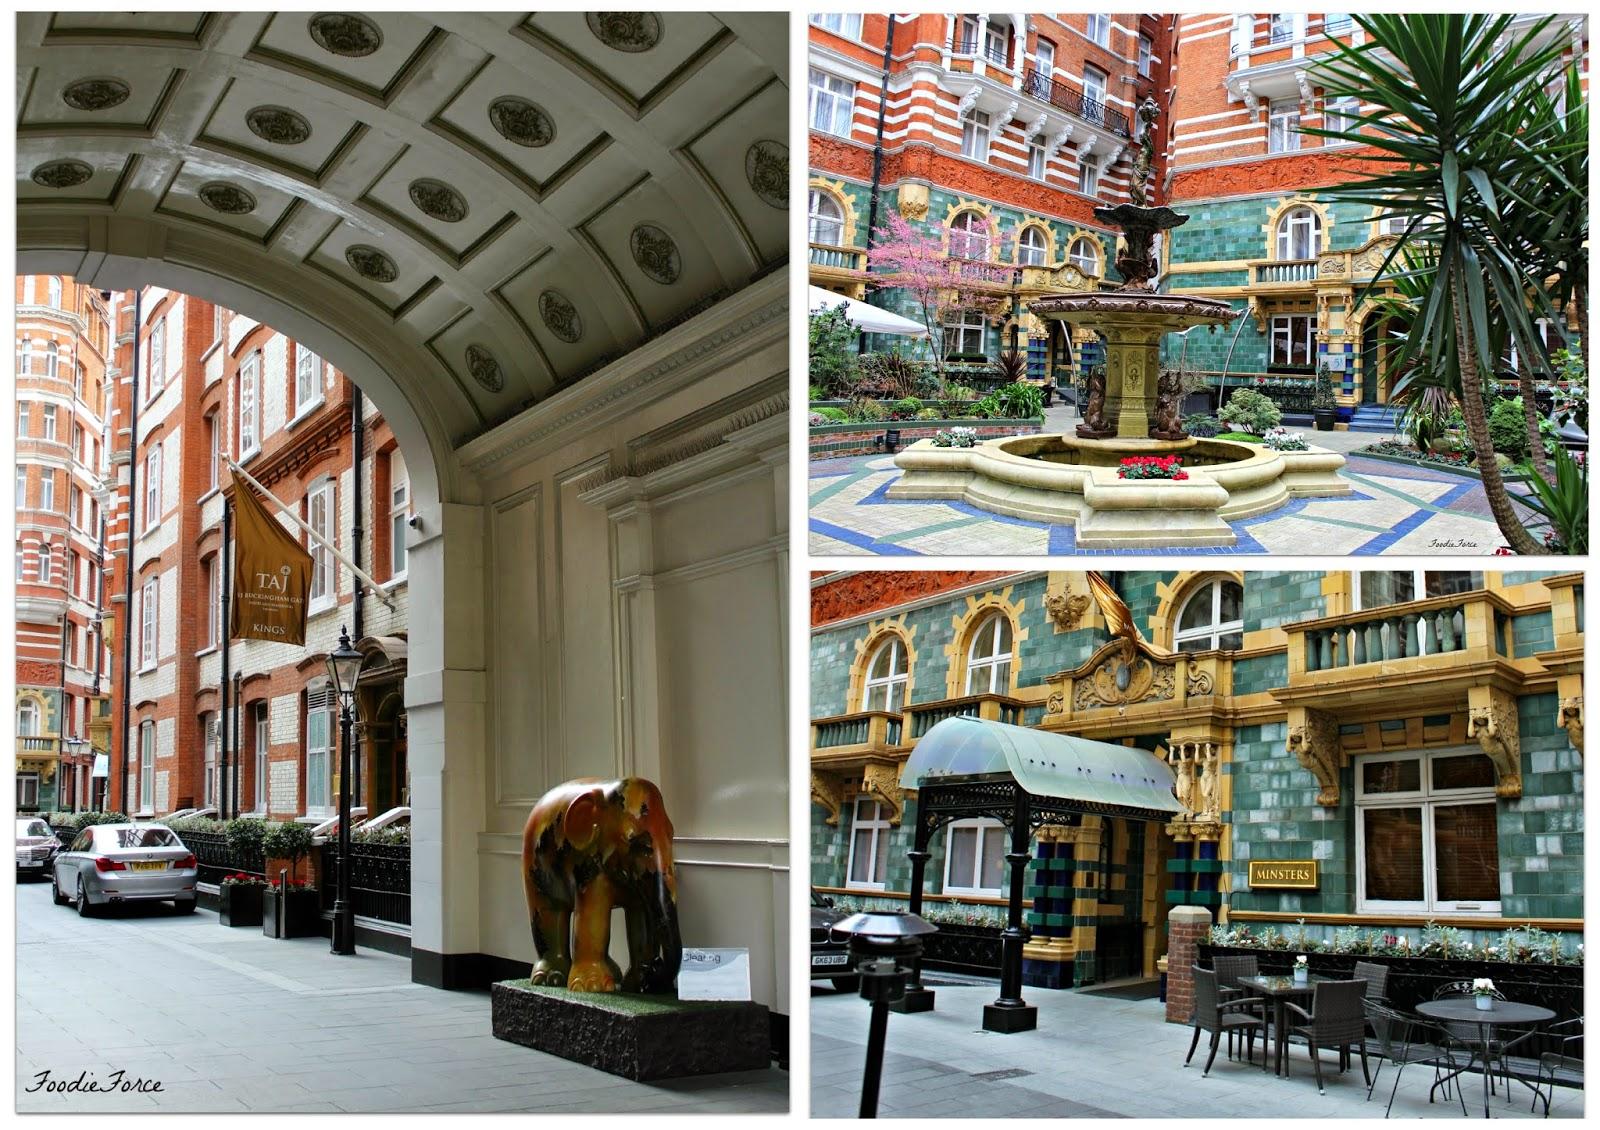 St James Court Hotel London